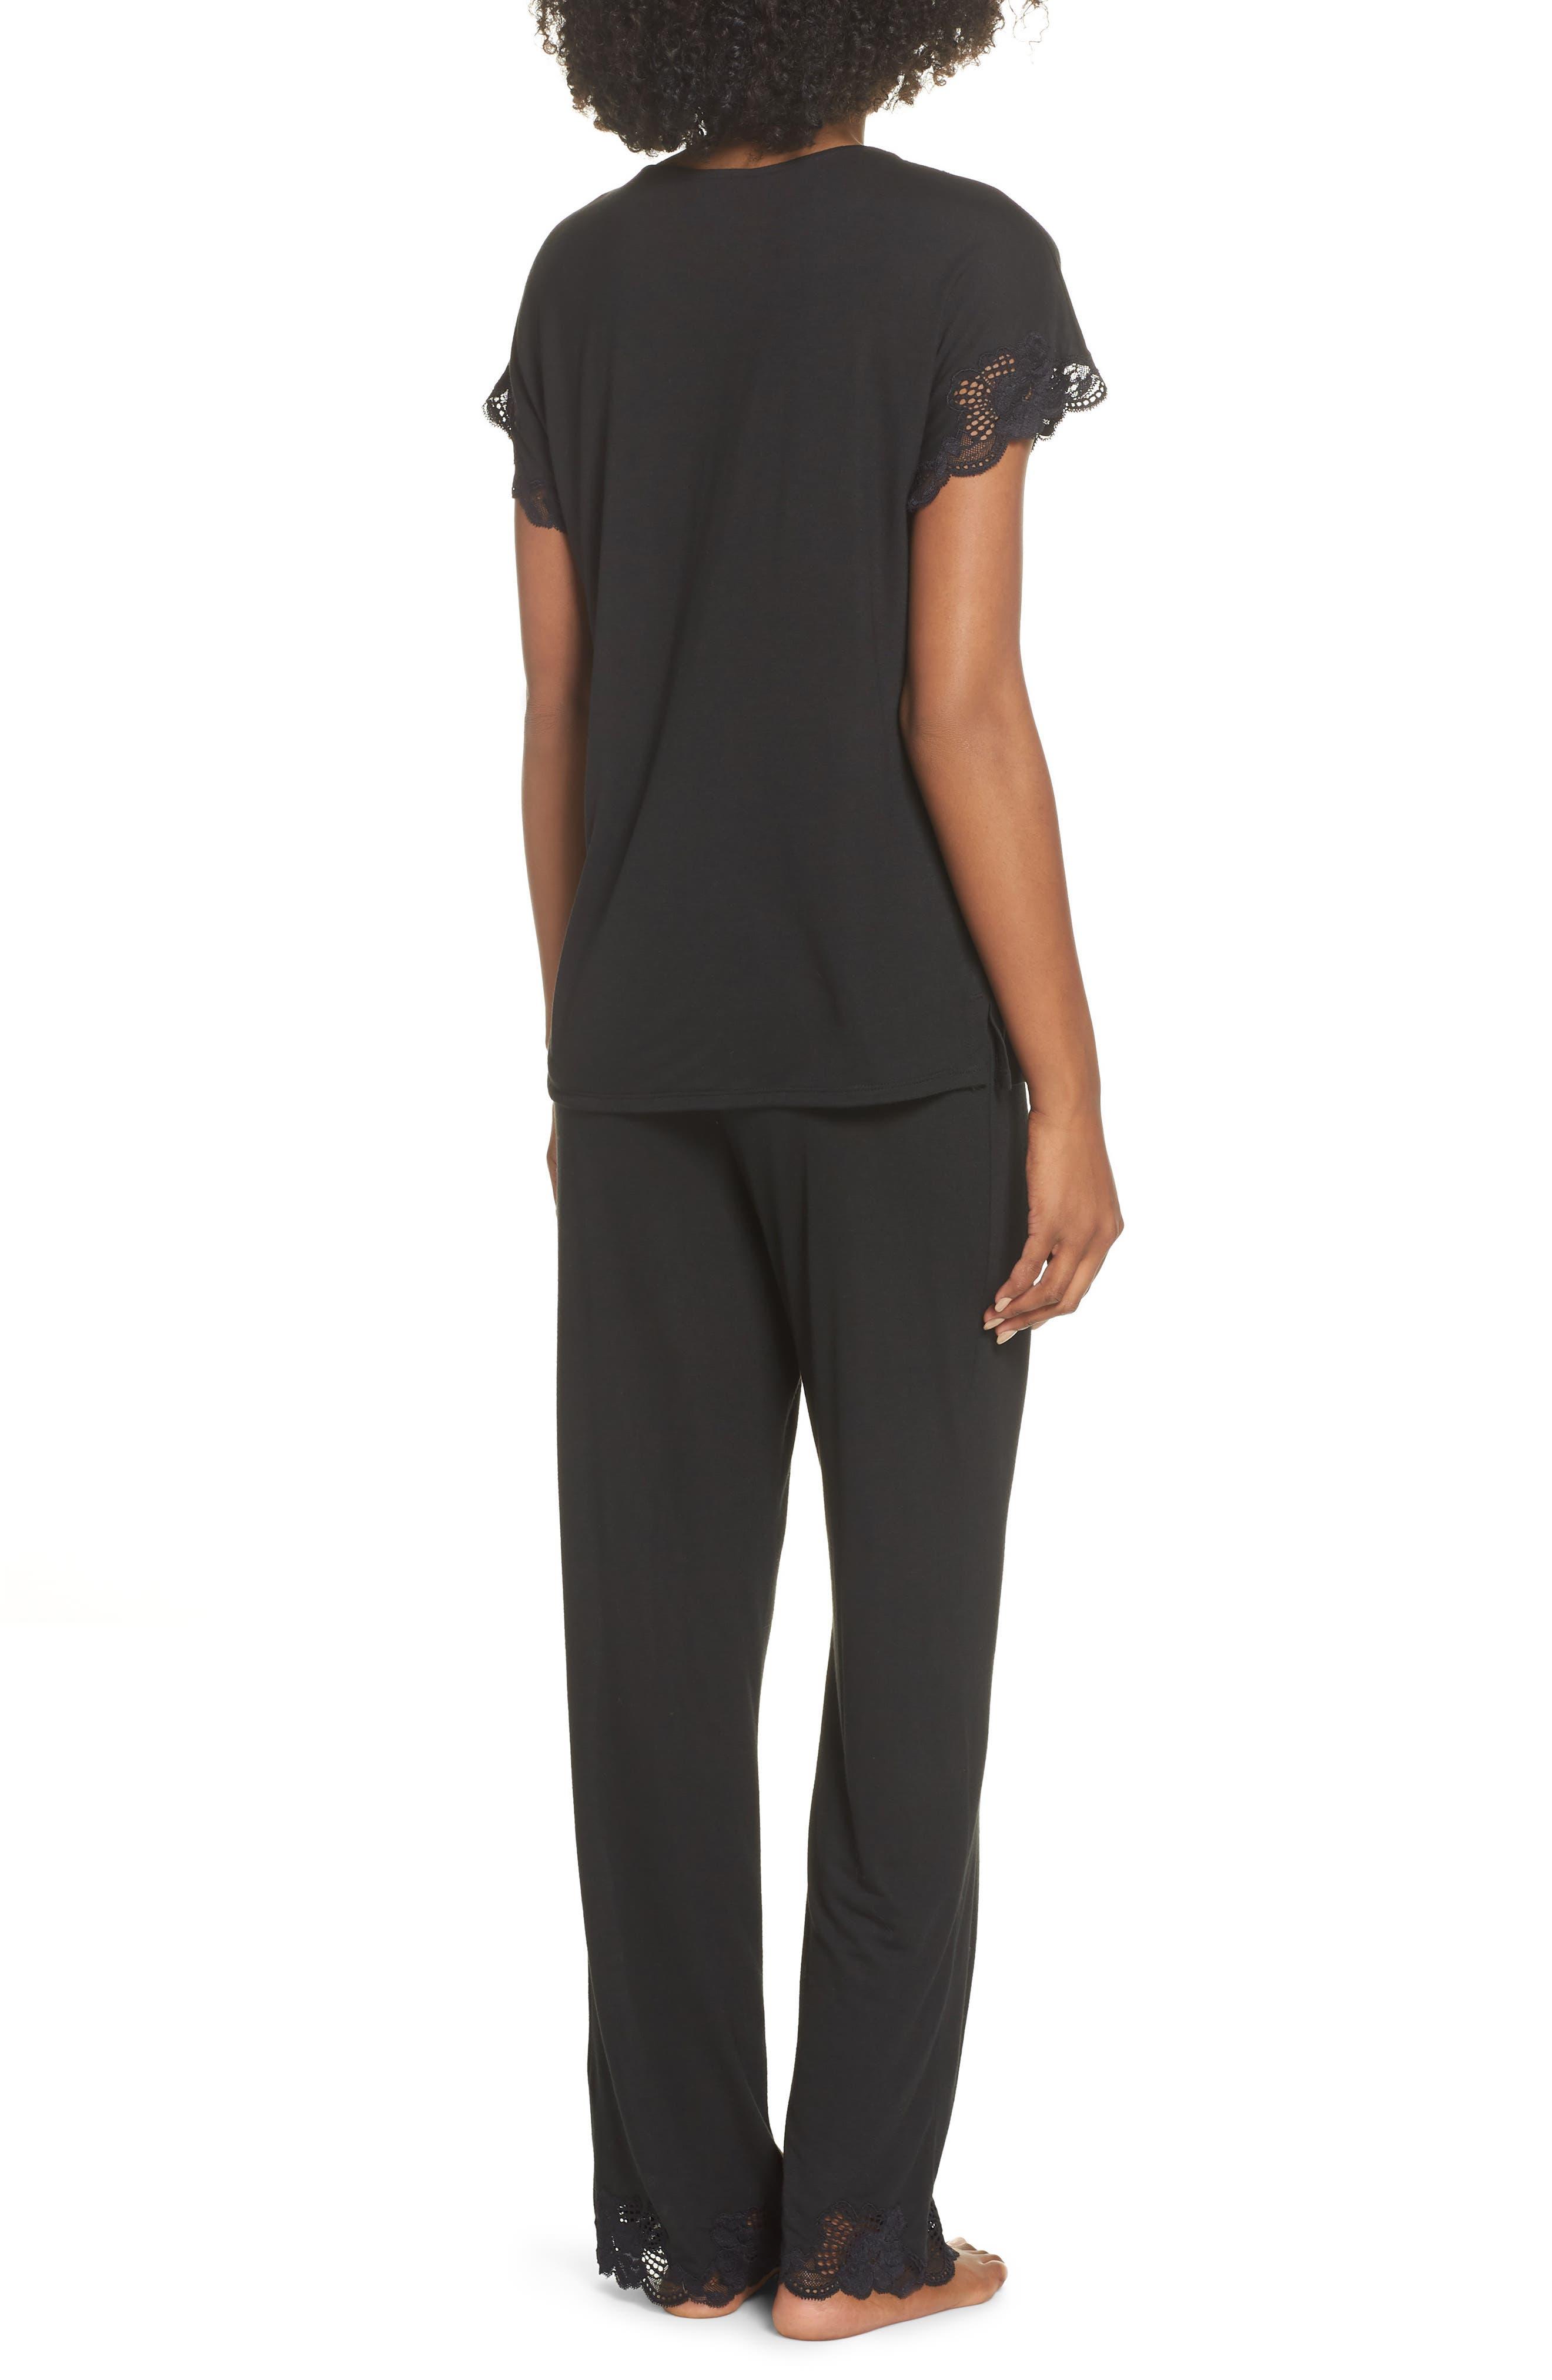 NATORI, 'Zen Floral' Pajama Set, Alternate thumbnail 2, color, BLACK